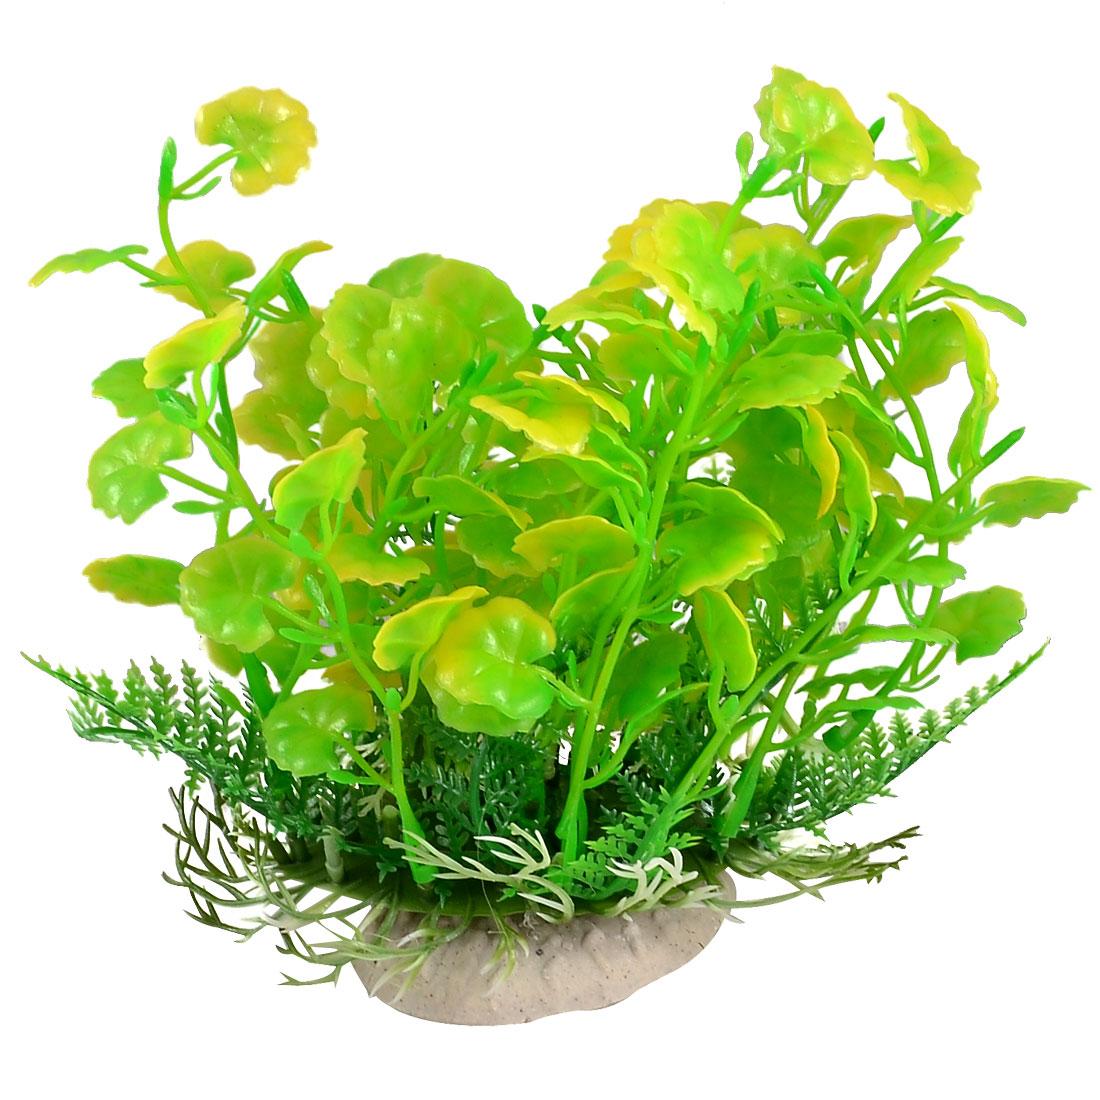 16.5cm Fishtank Fish Bowl Ornament Yellowgreen Plastic Leaf Plant